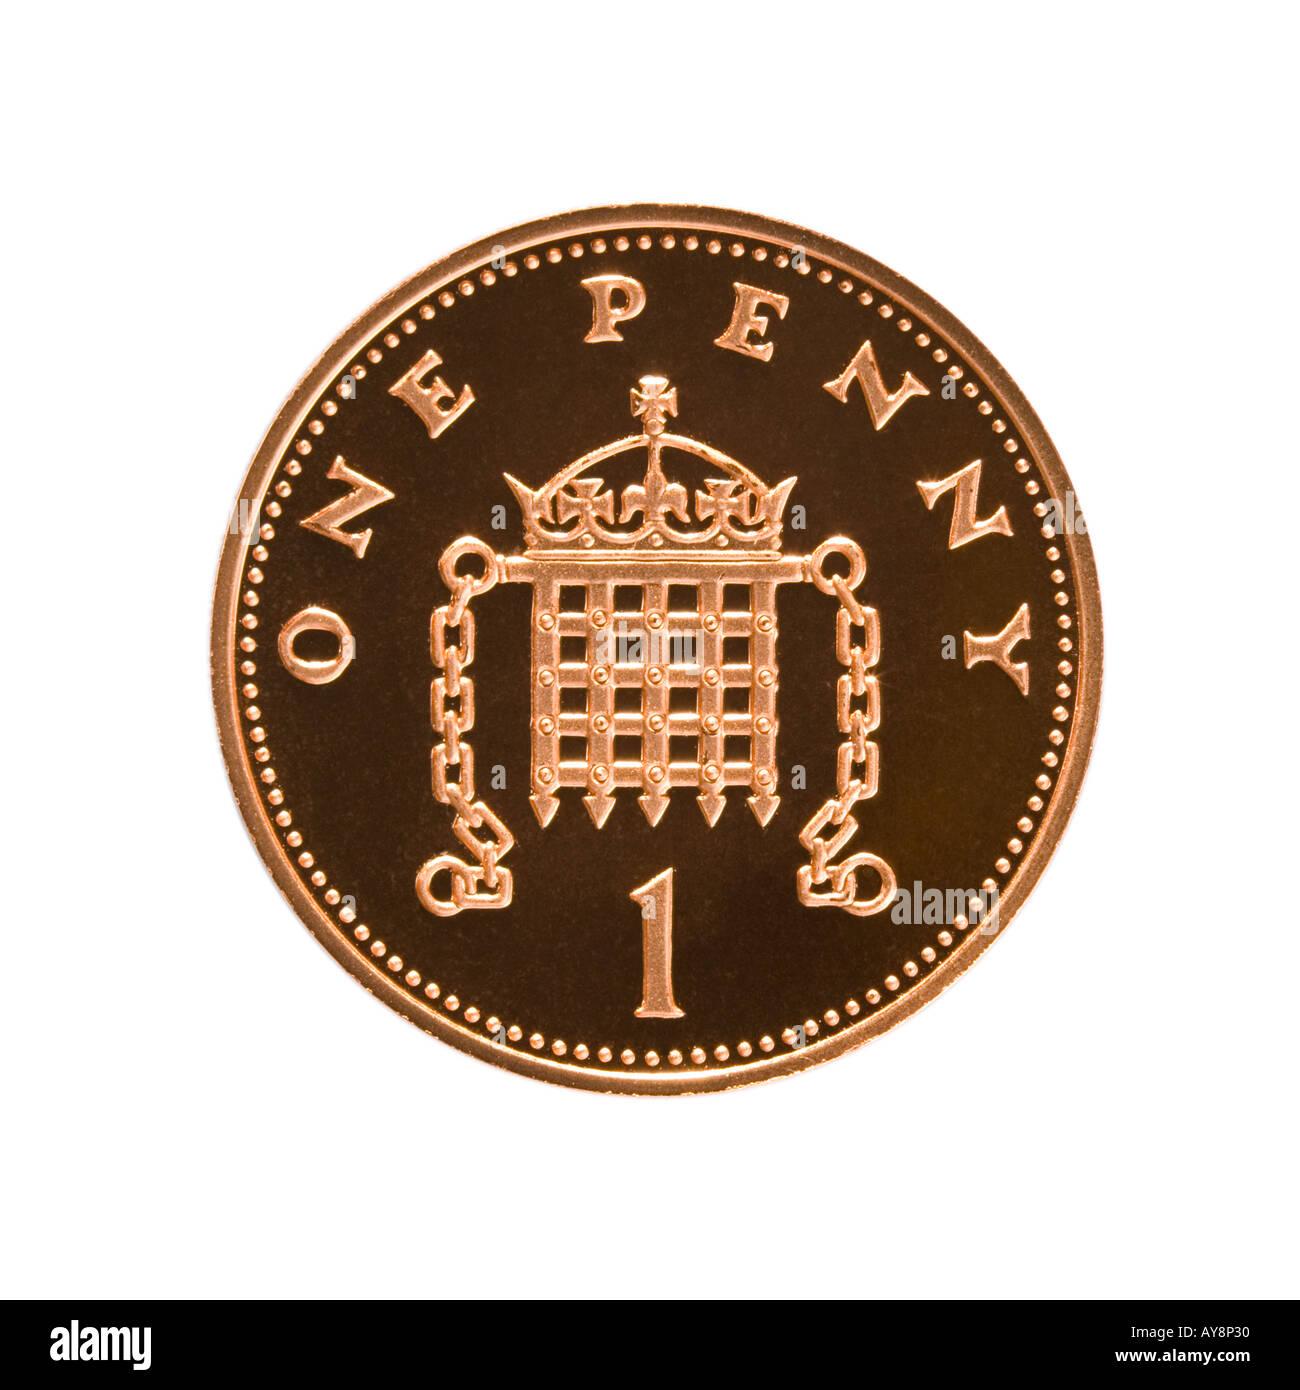 1 pence coin Stock Photo